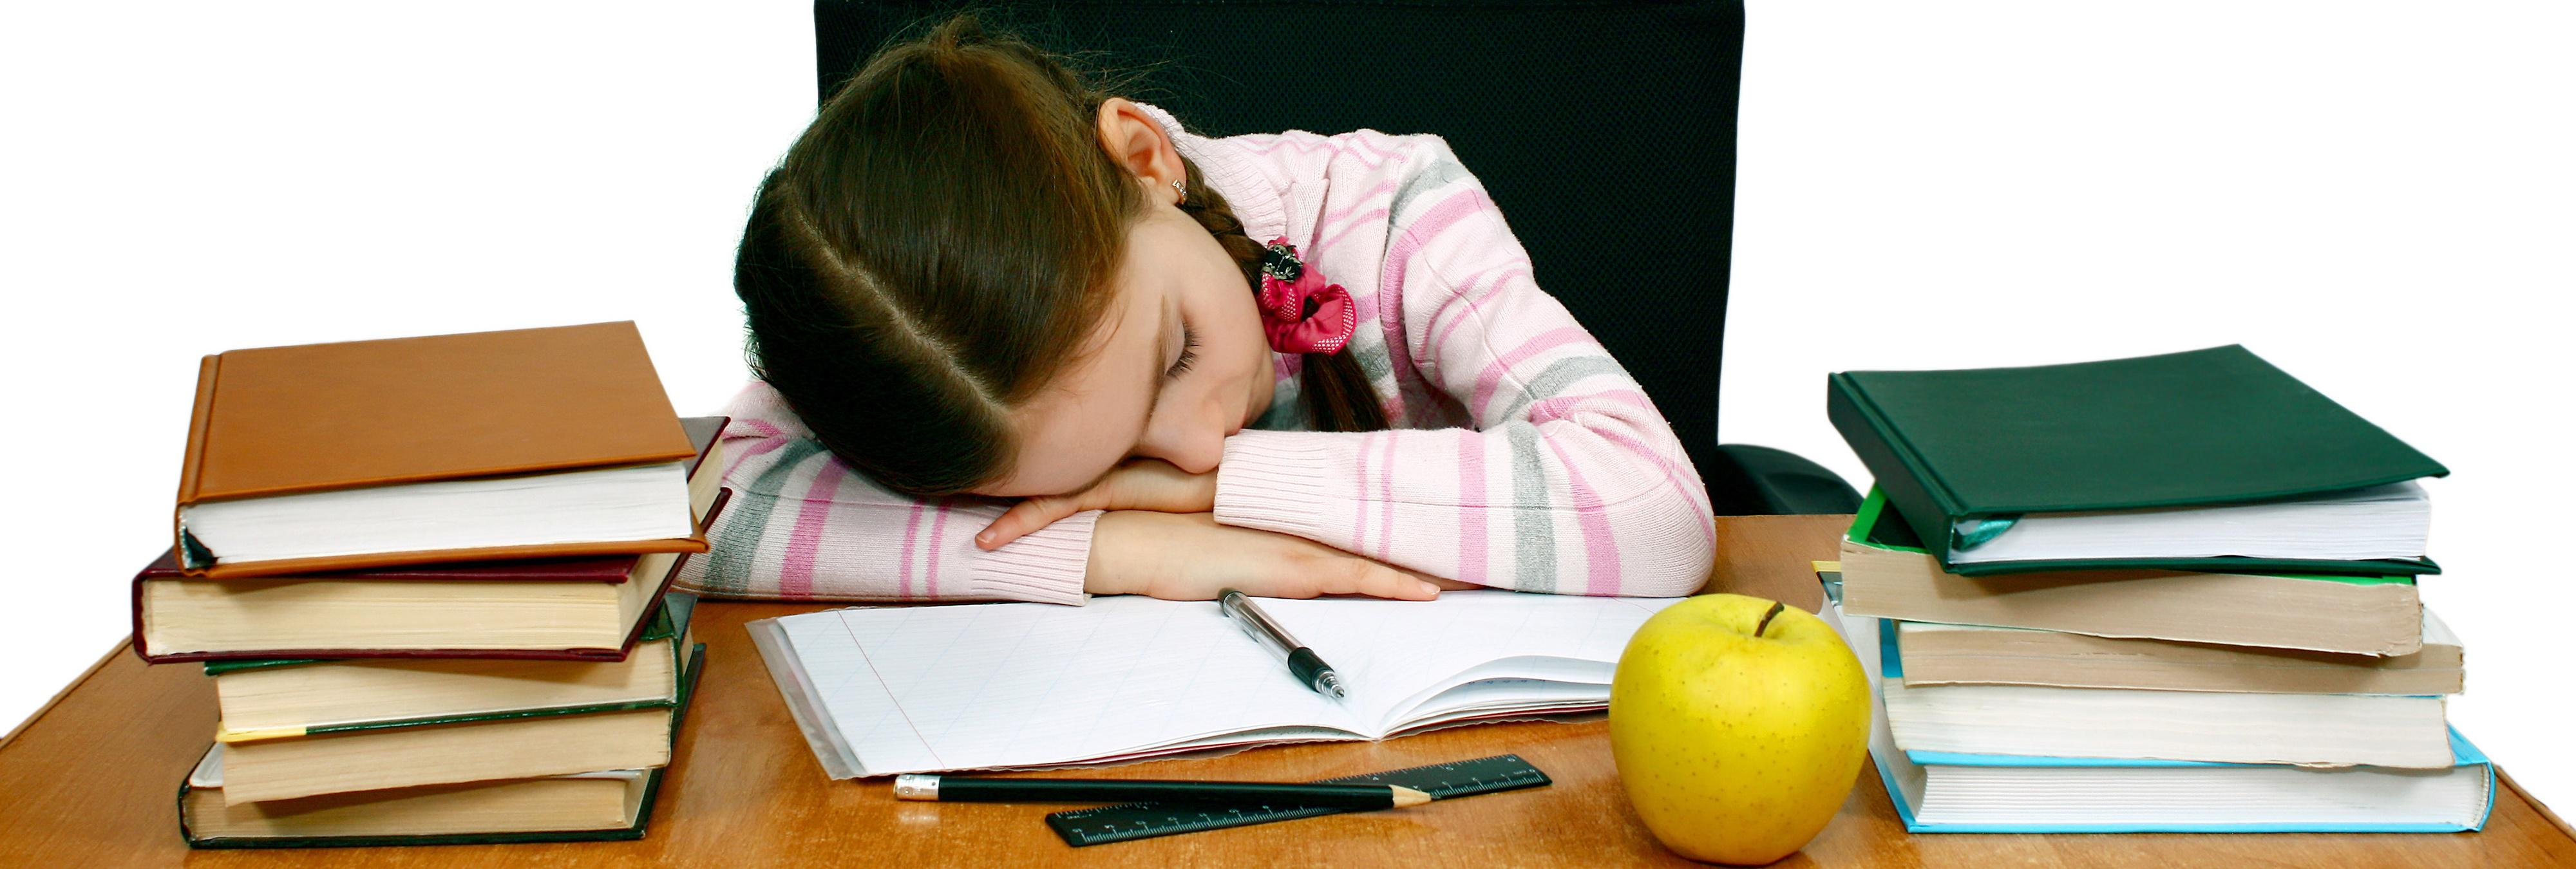 Vuelve el dilema: deberes, ¿sí o no?